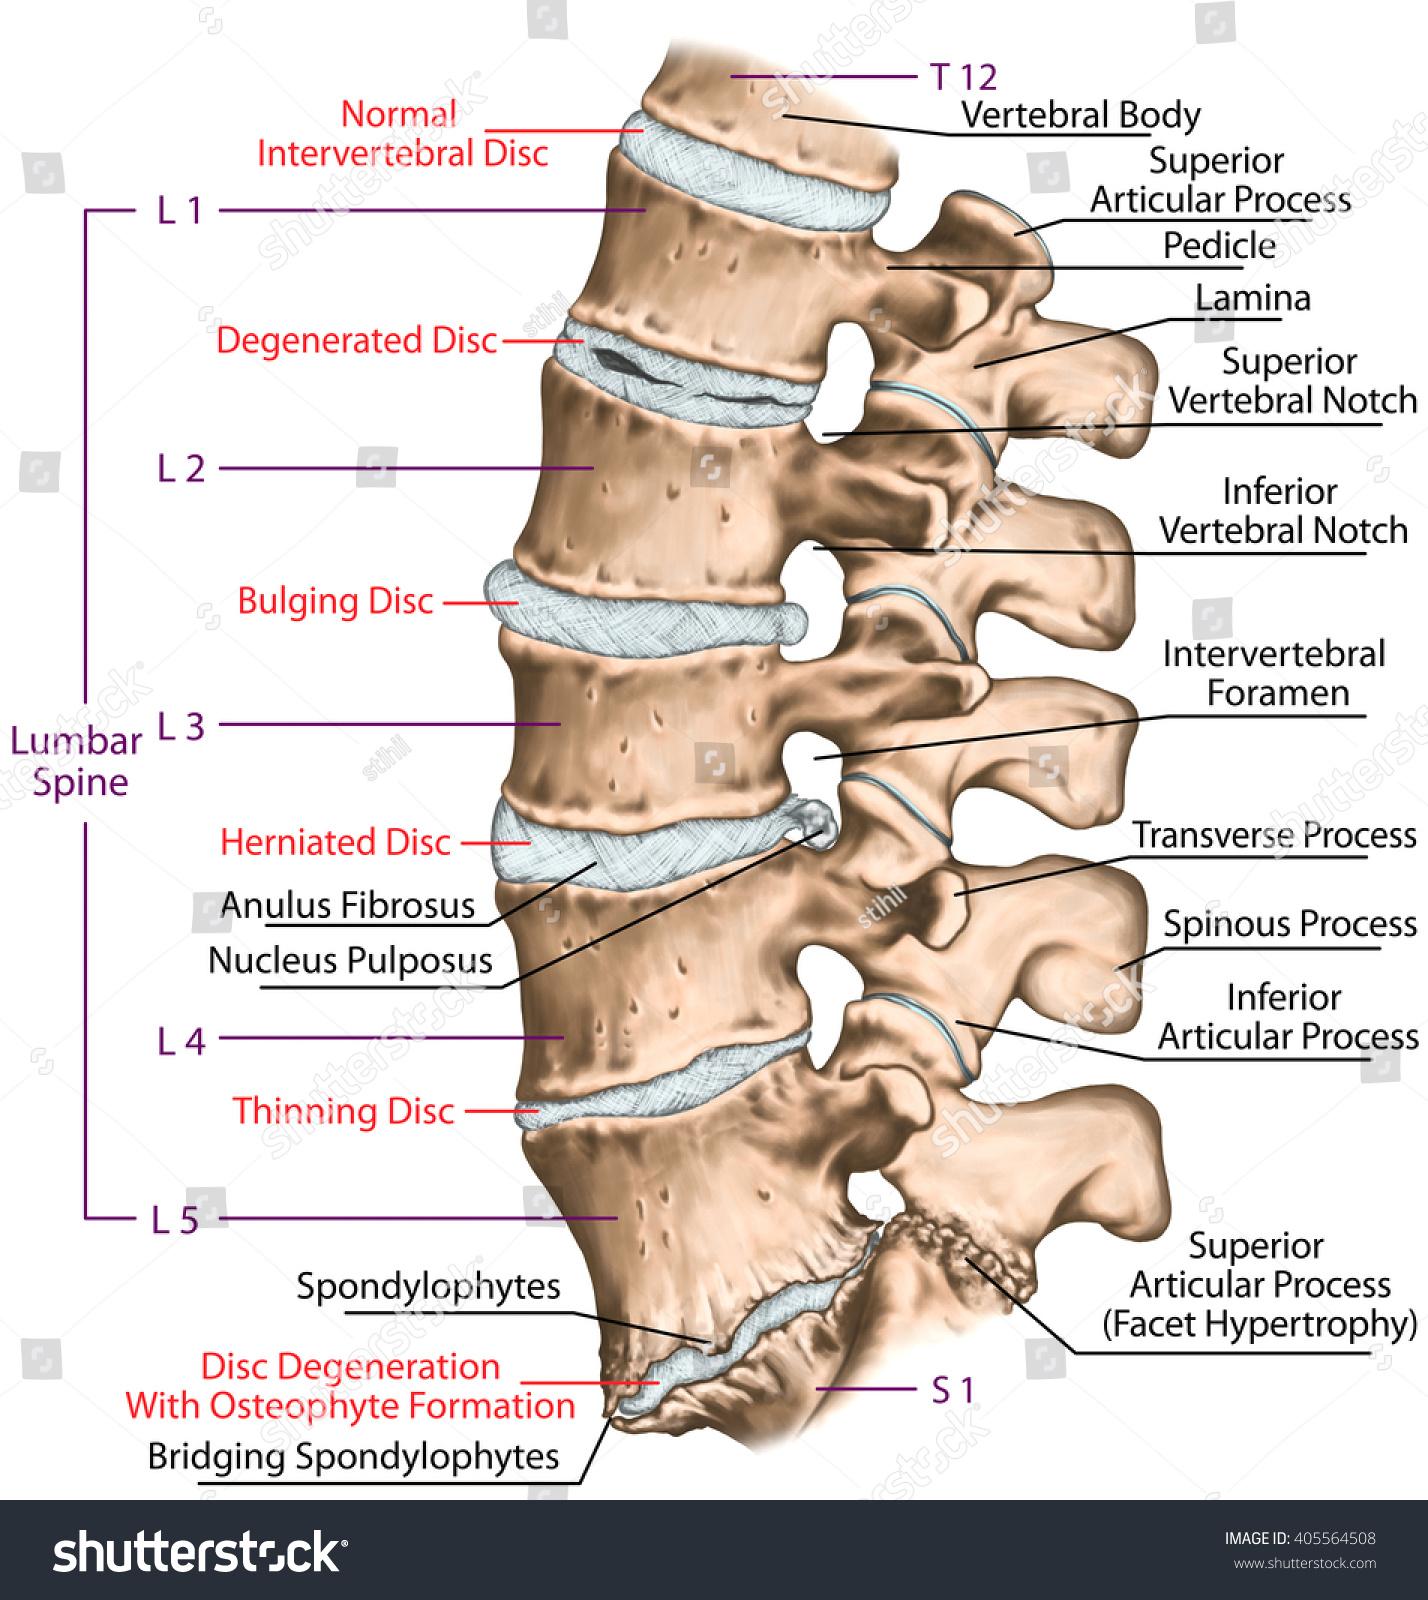 Spine Disc Problems Degenerative Lumbar Disc Stock Illustration